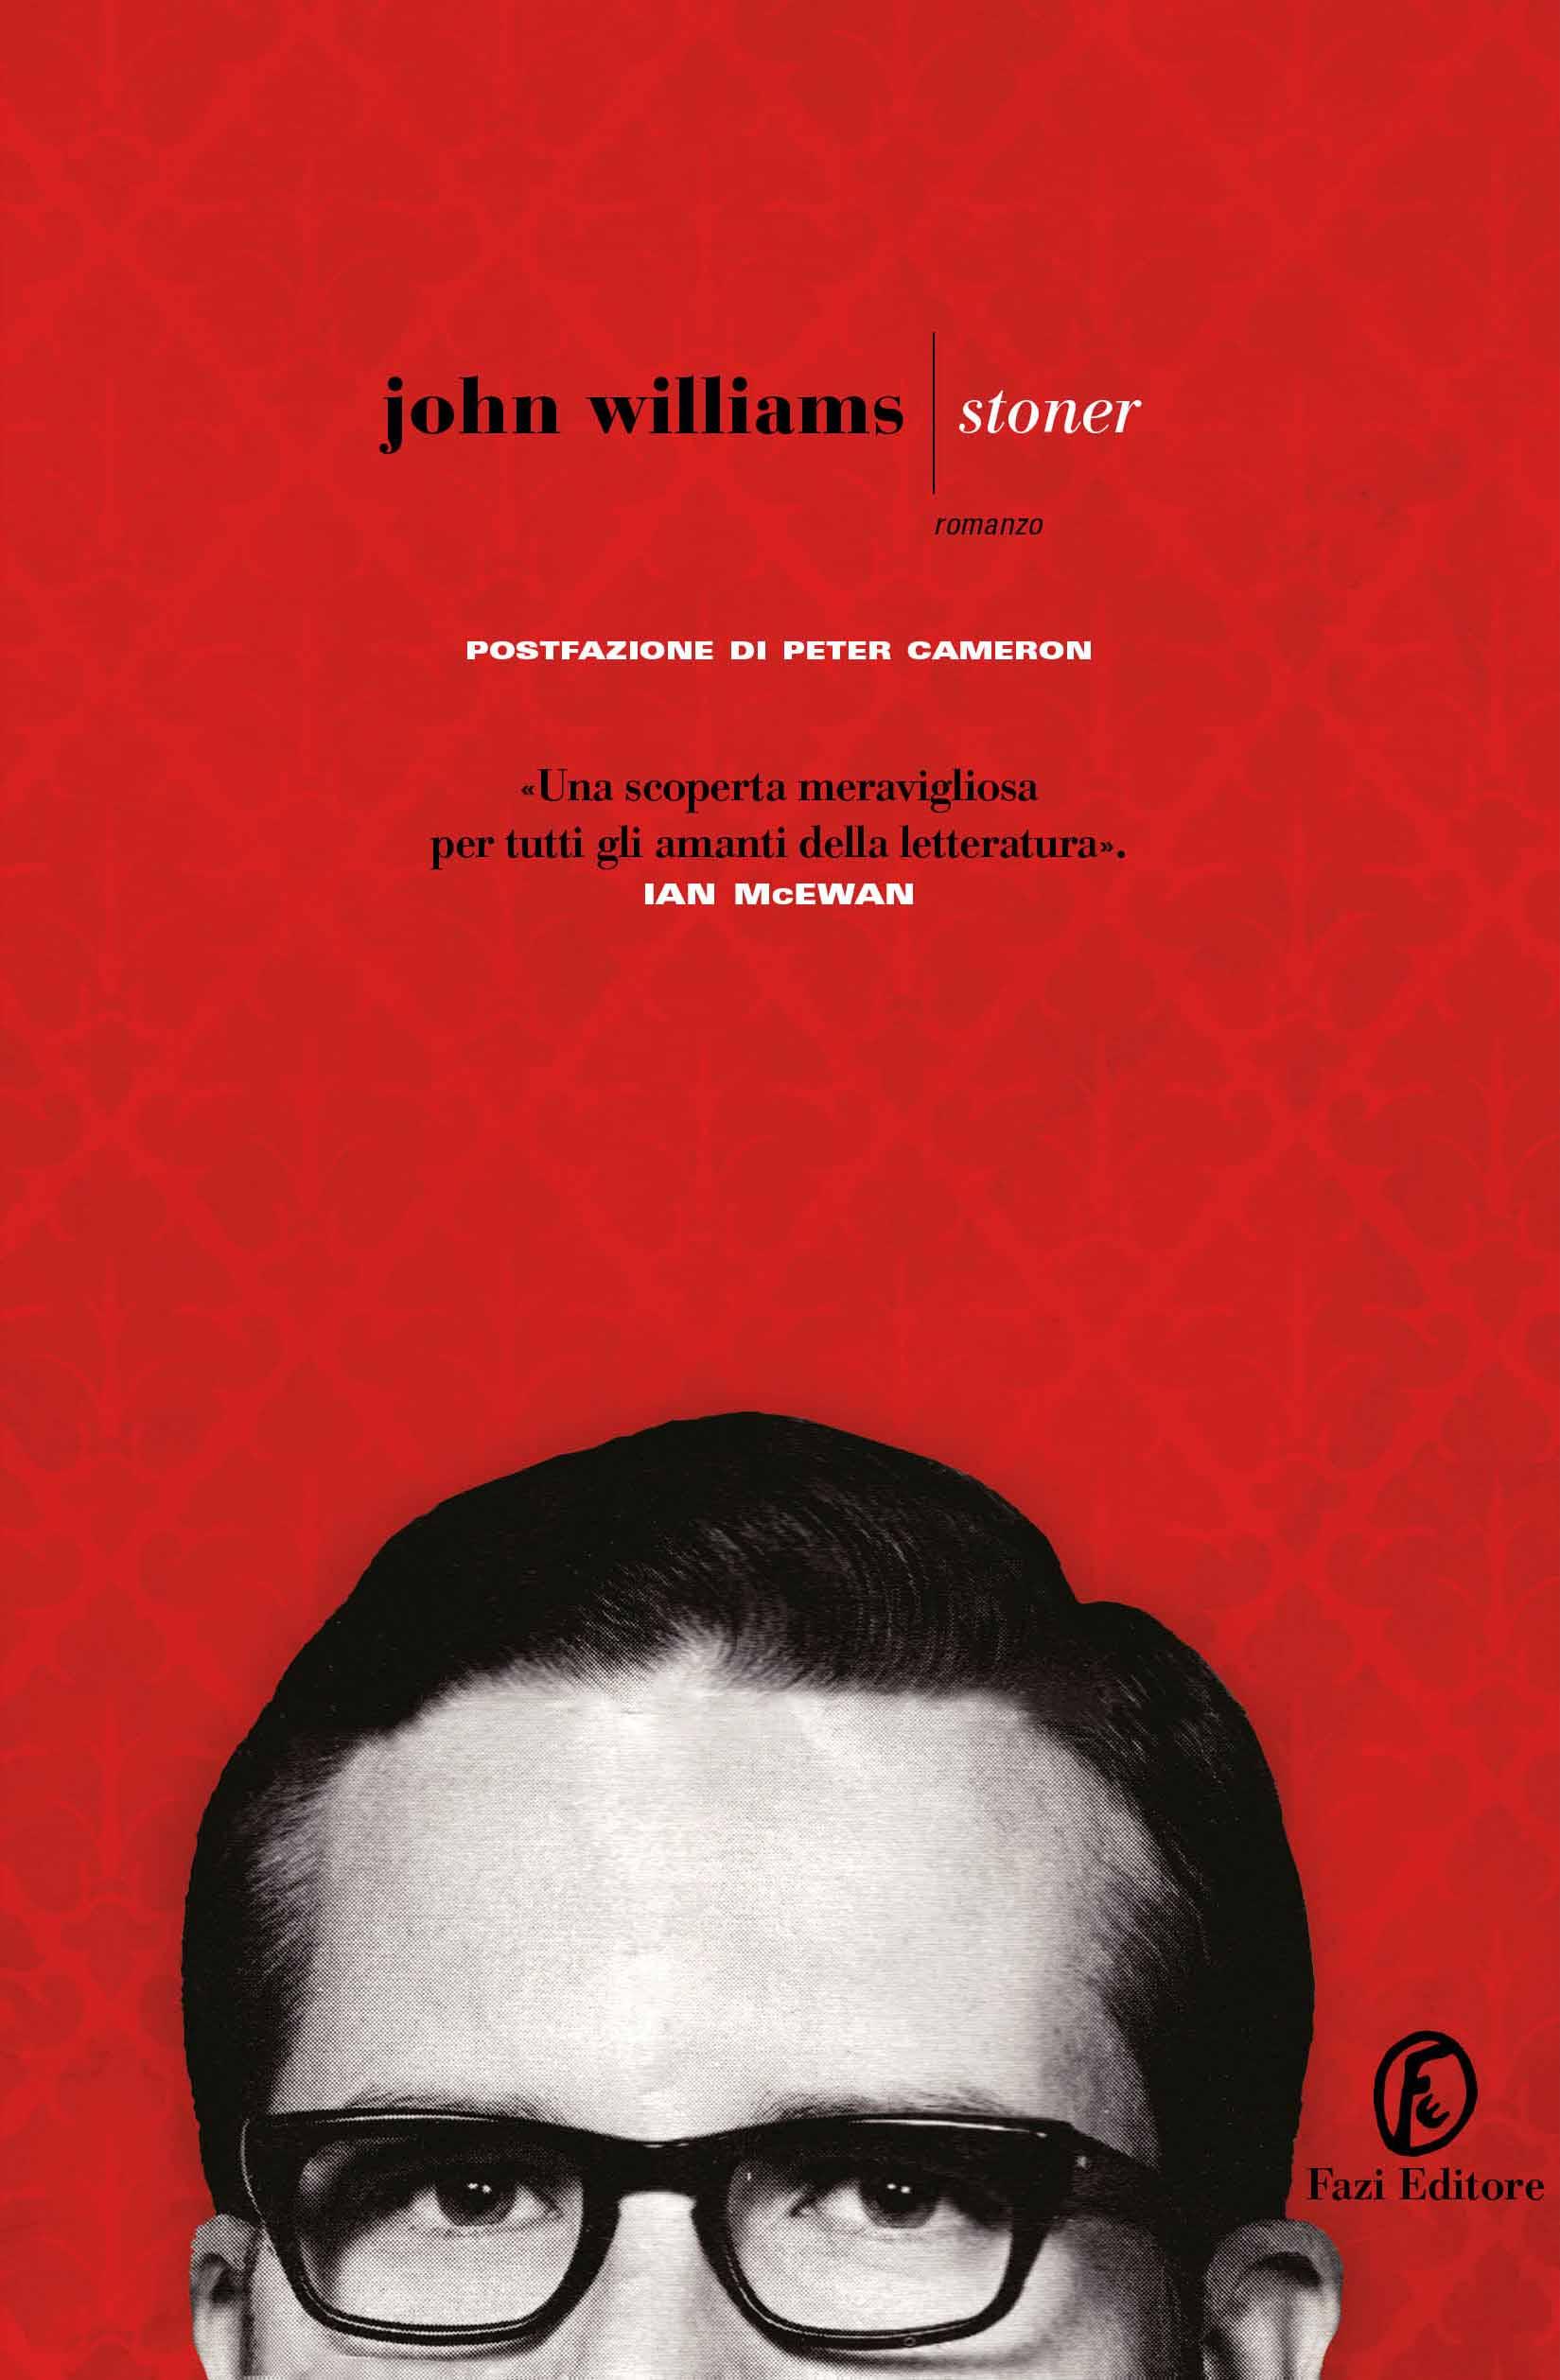 Stoner, John Williams